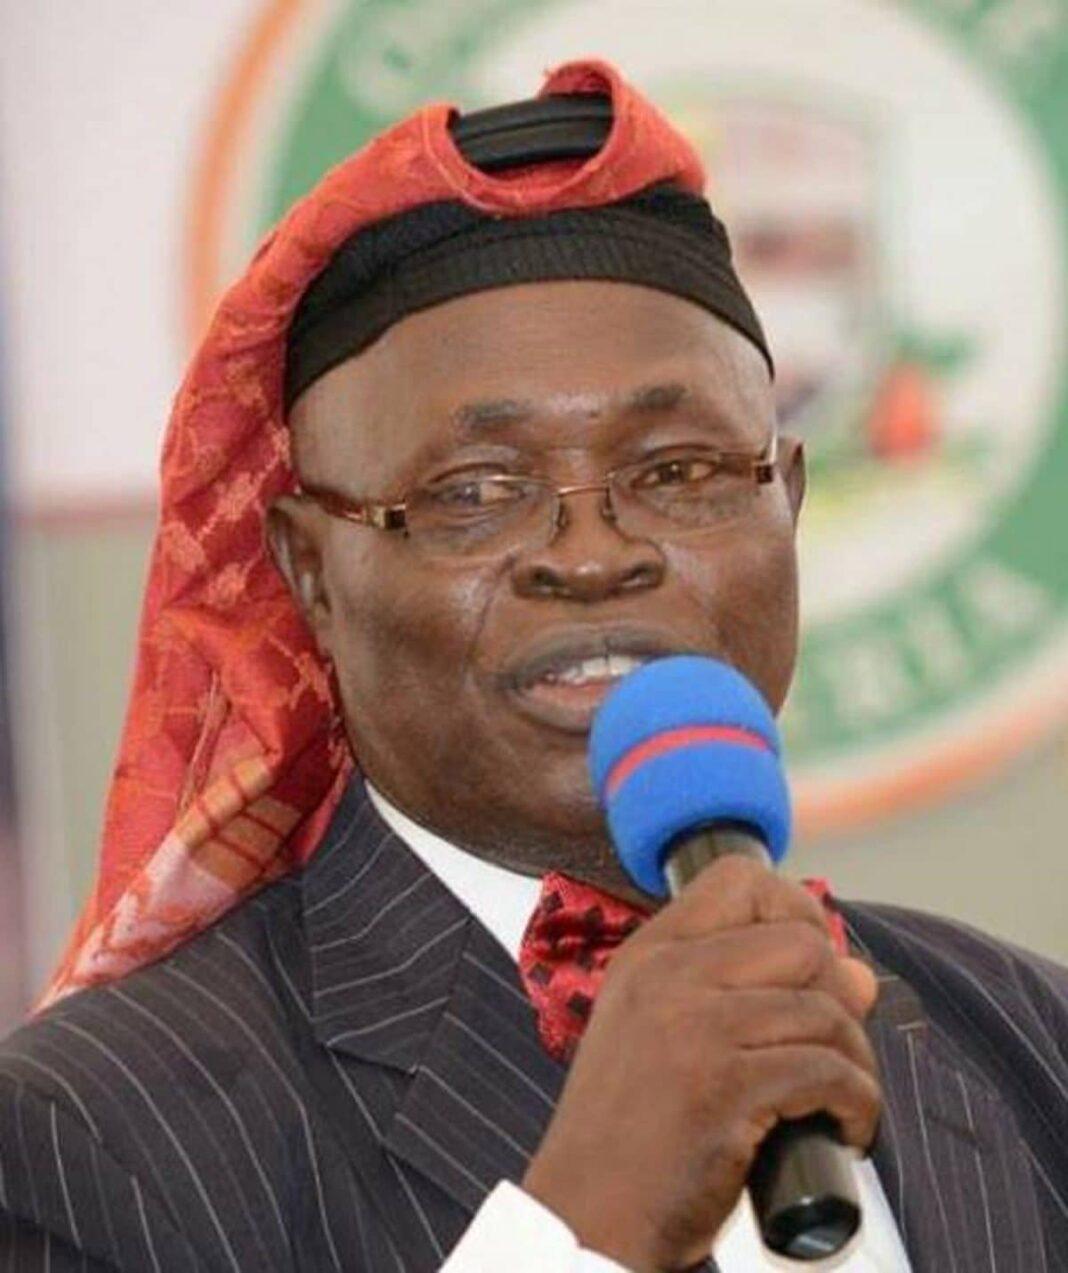 Nigeria news : Islamic human rights organization sends message to Nigerian soldiers